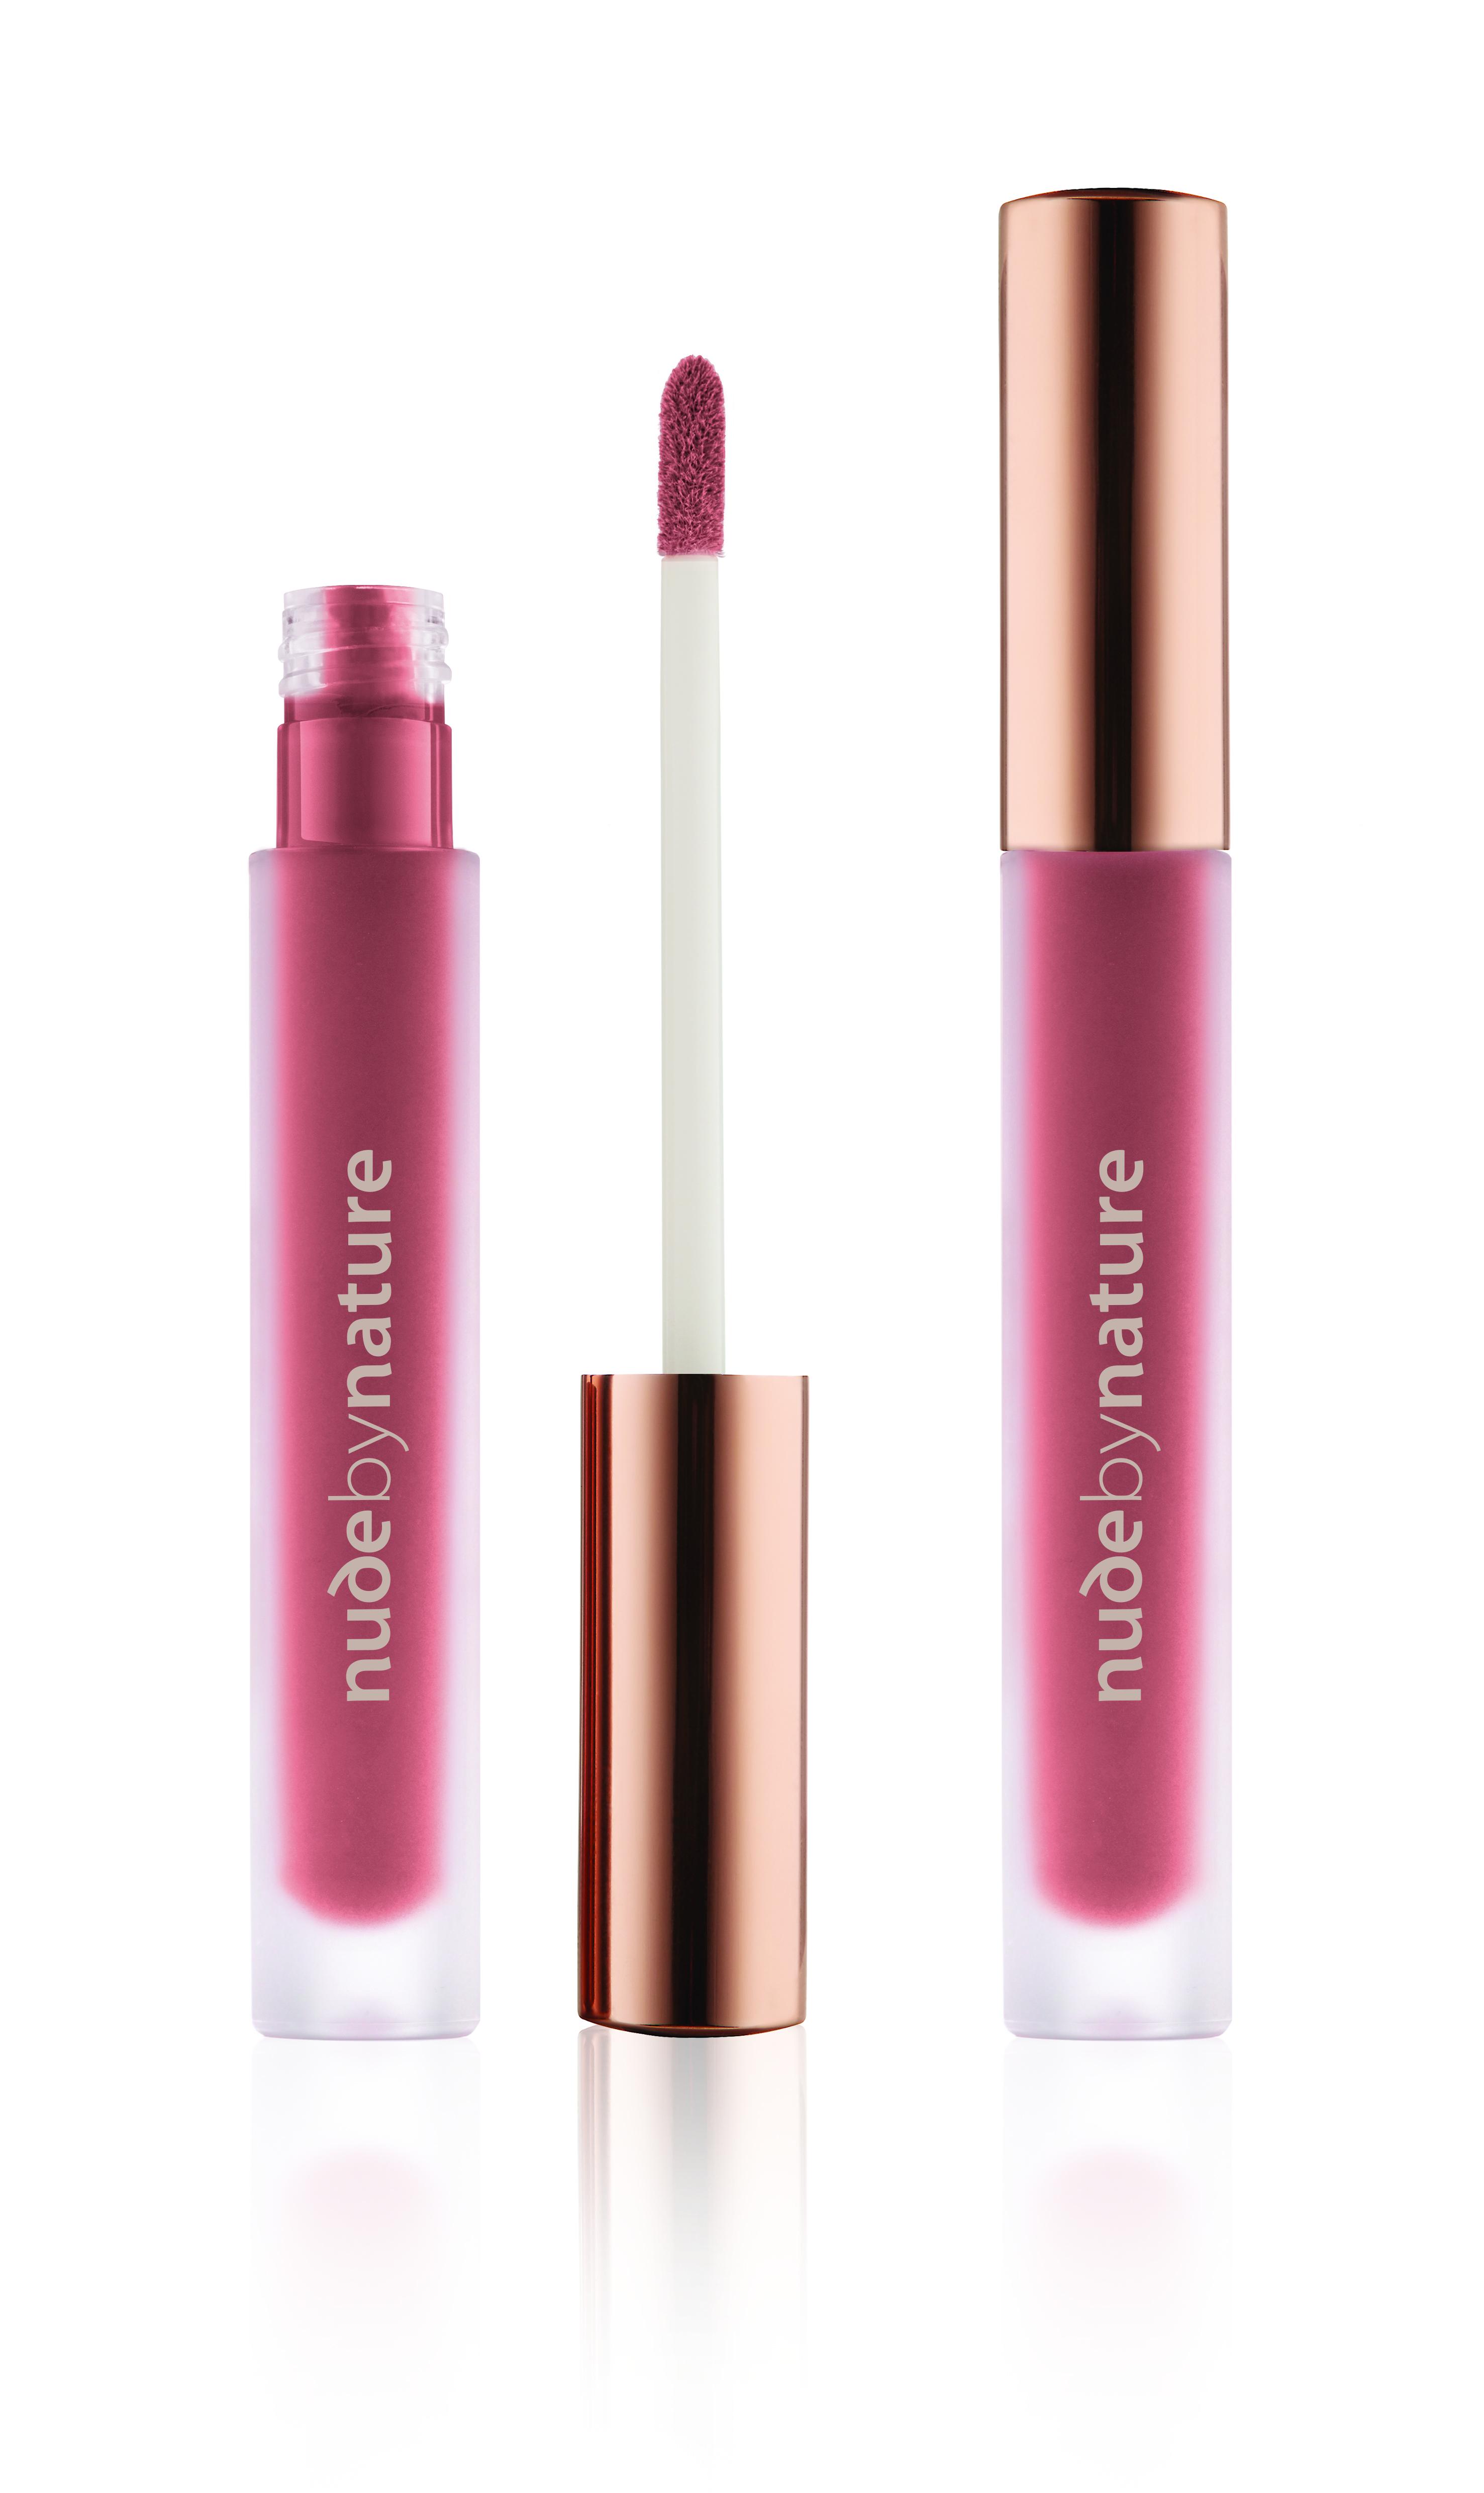 Nude by Nature - Satin Liquid Lipstick - 05 Sun Kissed